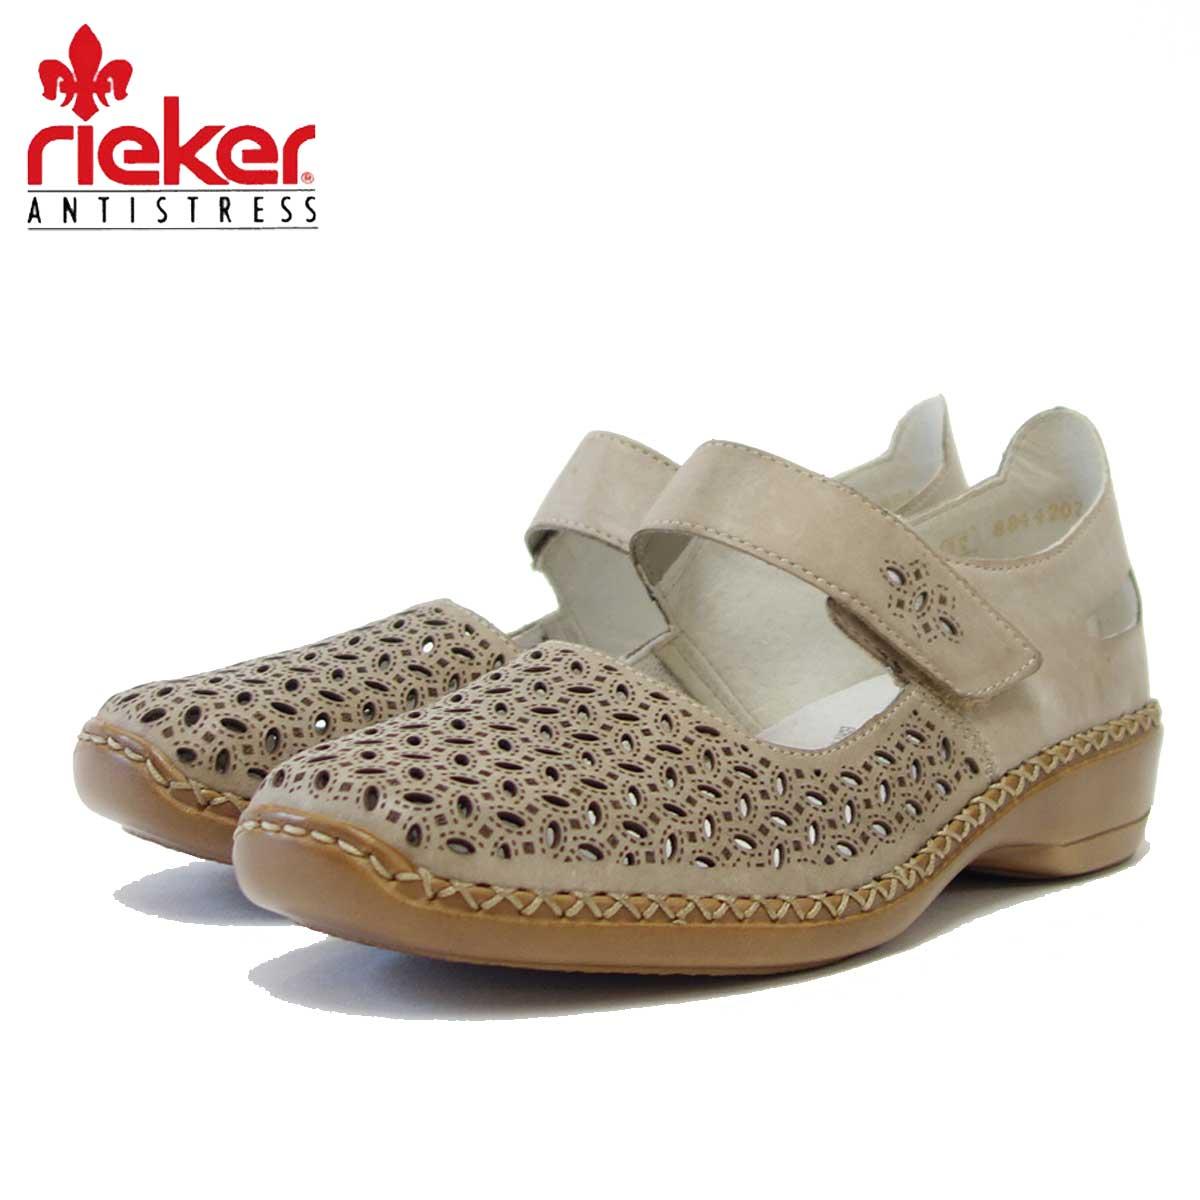 rieker リーカー 463G8 62 Clay / Silver (レディース) クッション性の良いお洒落ストラップシューズ 「靴」